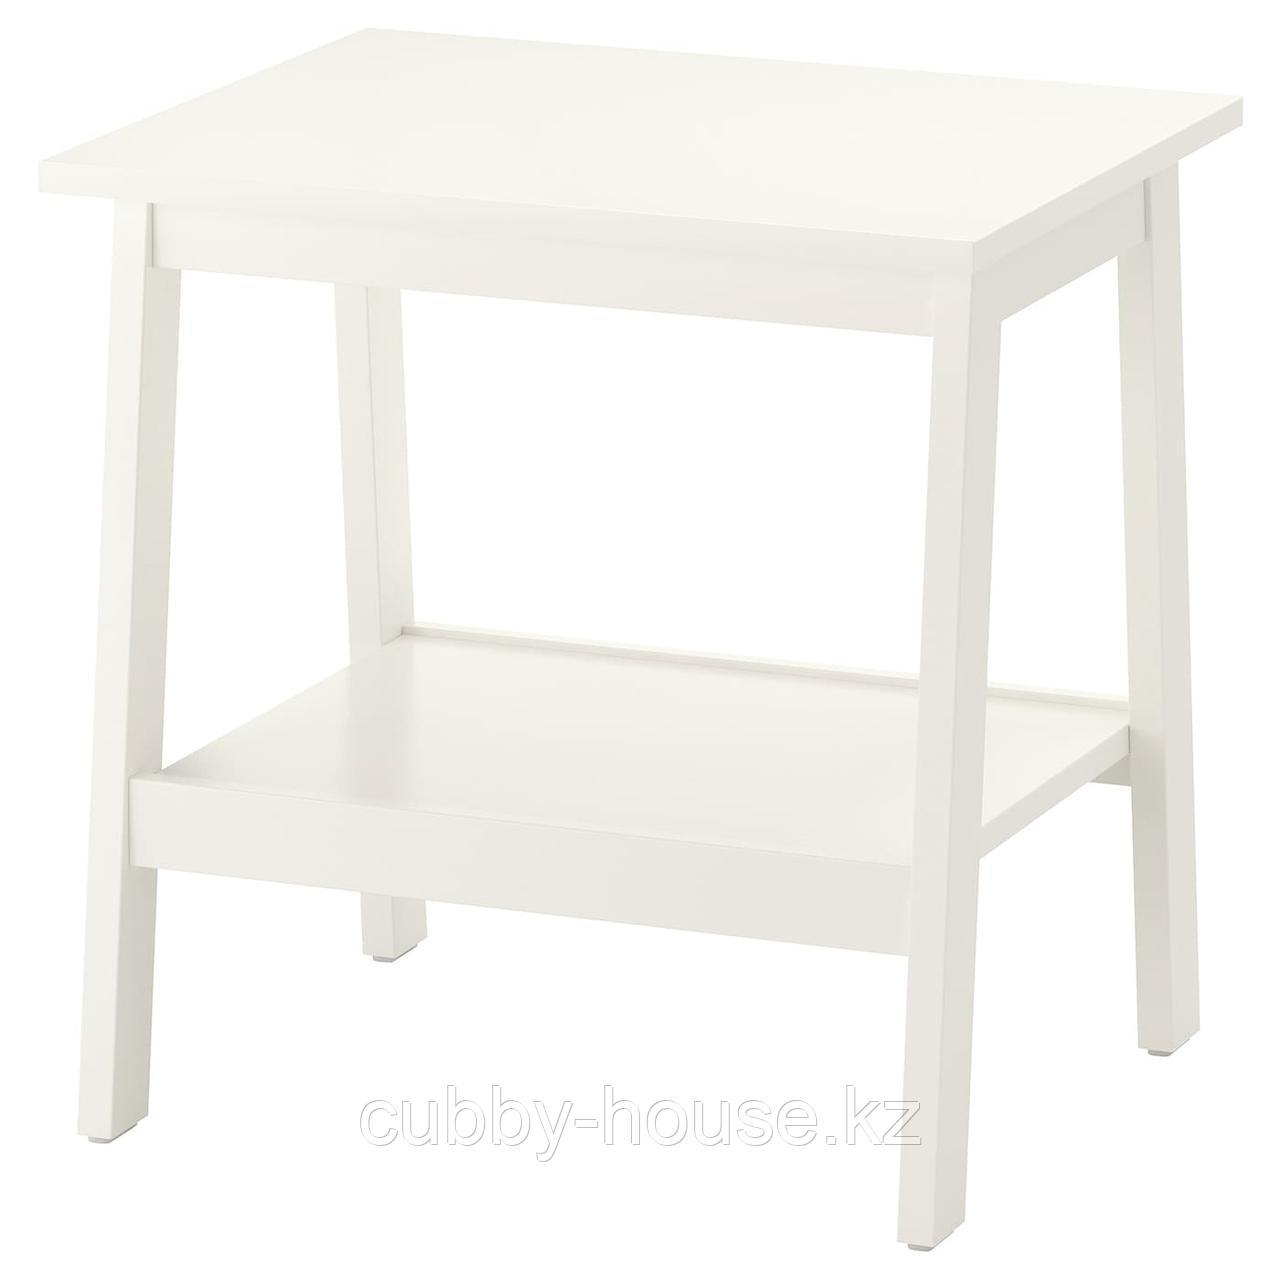 ЛУНАРП Придиванный столик, белый, 55x45 см